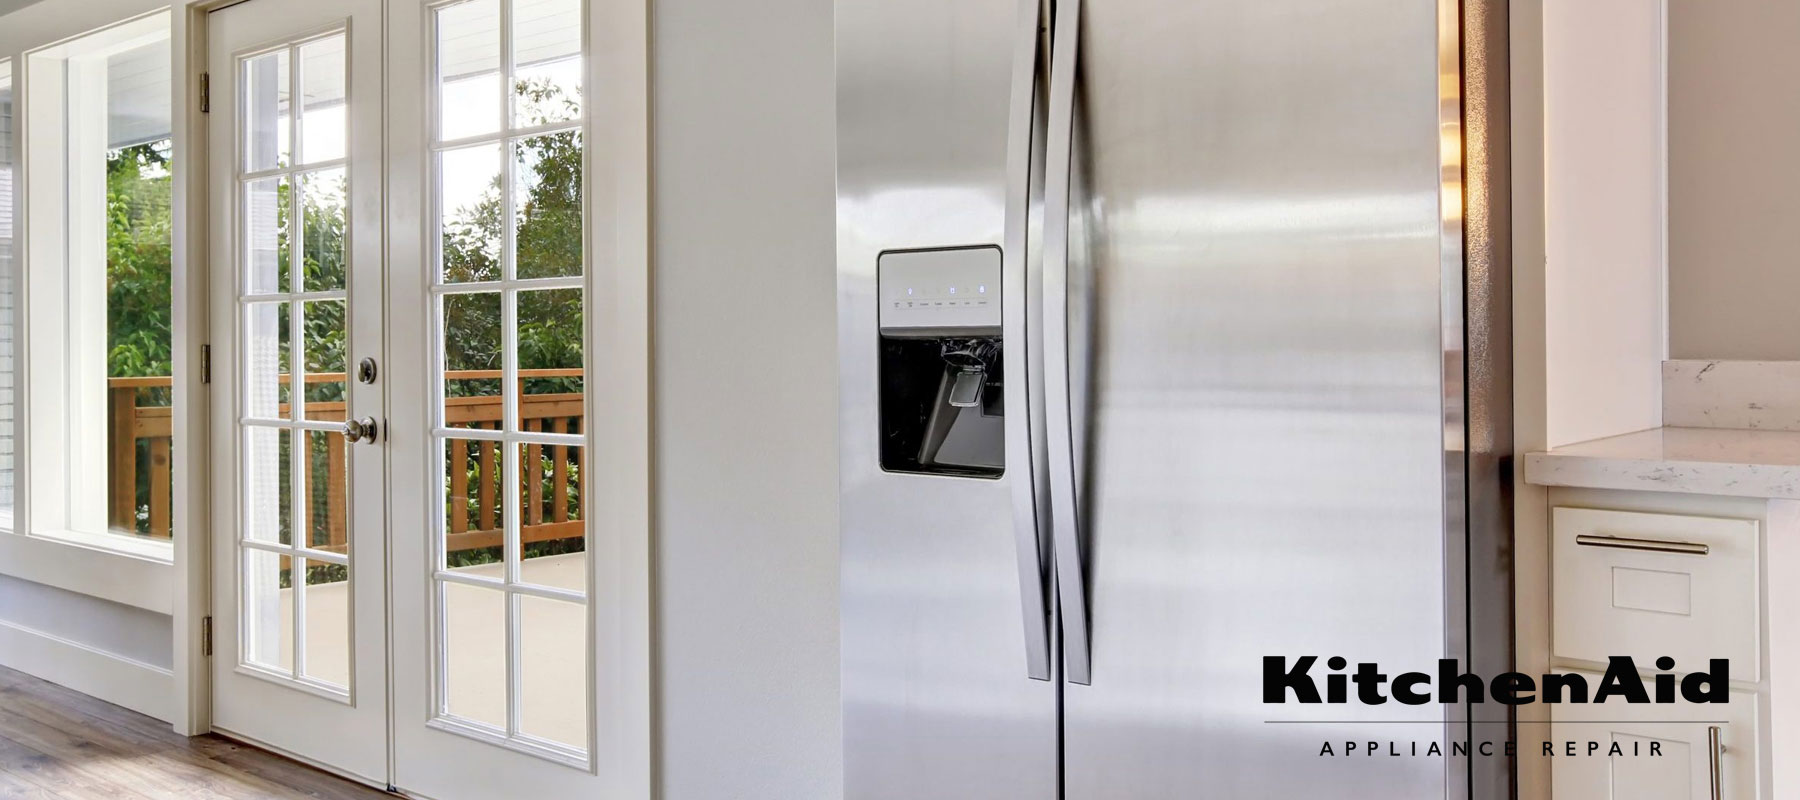 Why Is Kitchenaid Fridge Over Temperature Alarm Going Off? | KitchenAid Appliance Repair Professionals